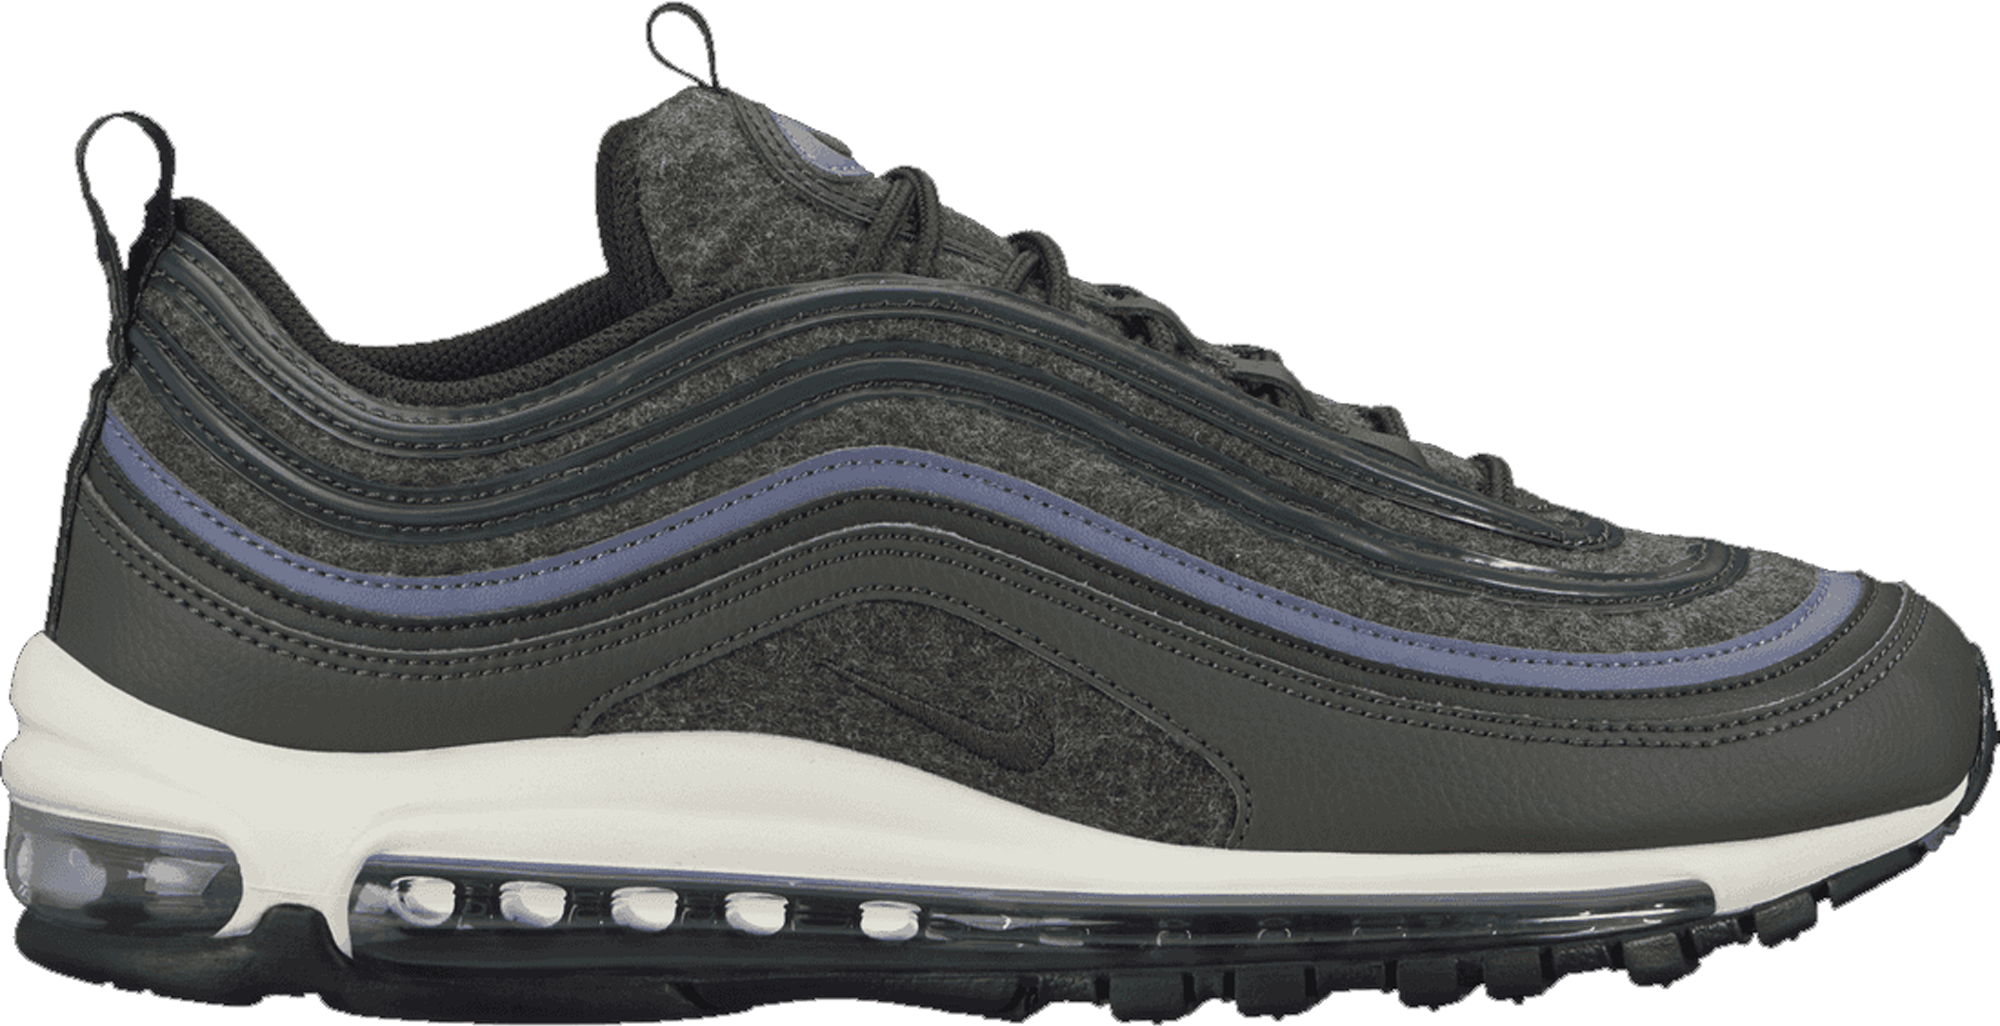 Nike Air Max 97 Wool Sequoia - 312834-300